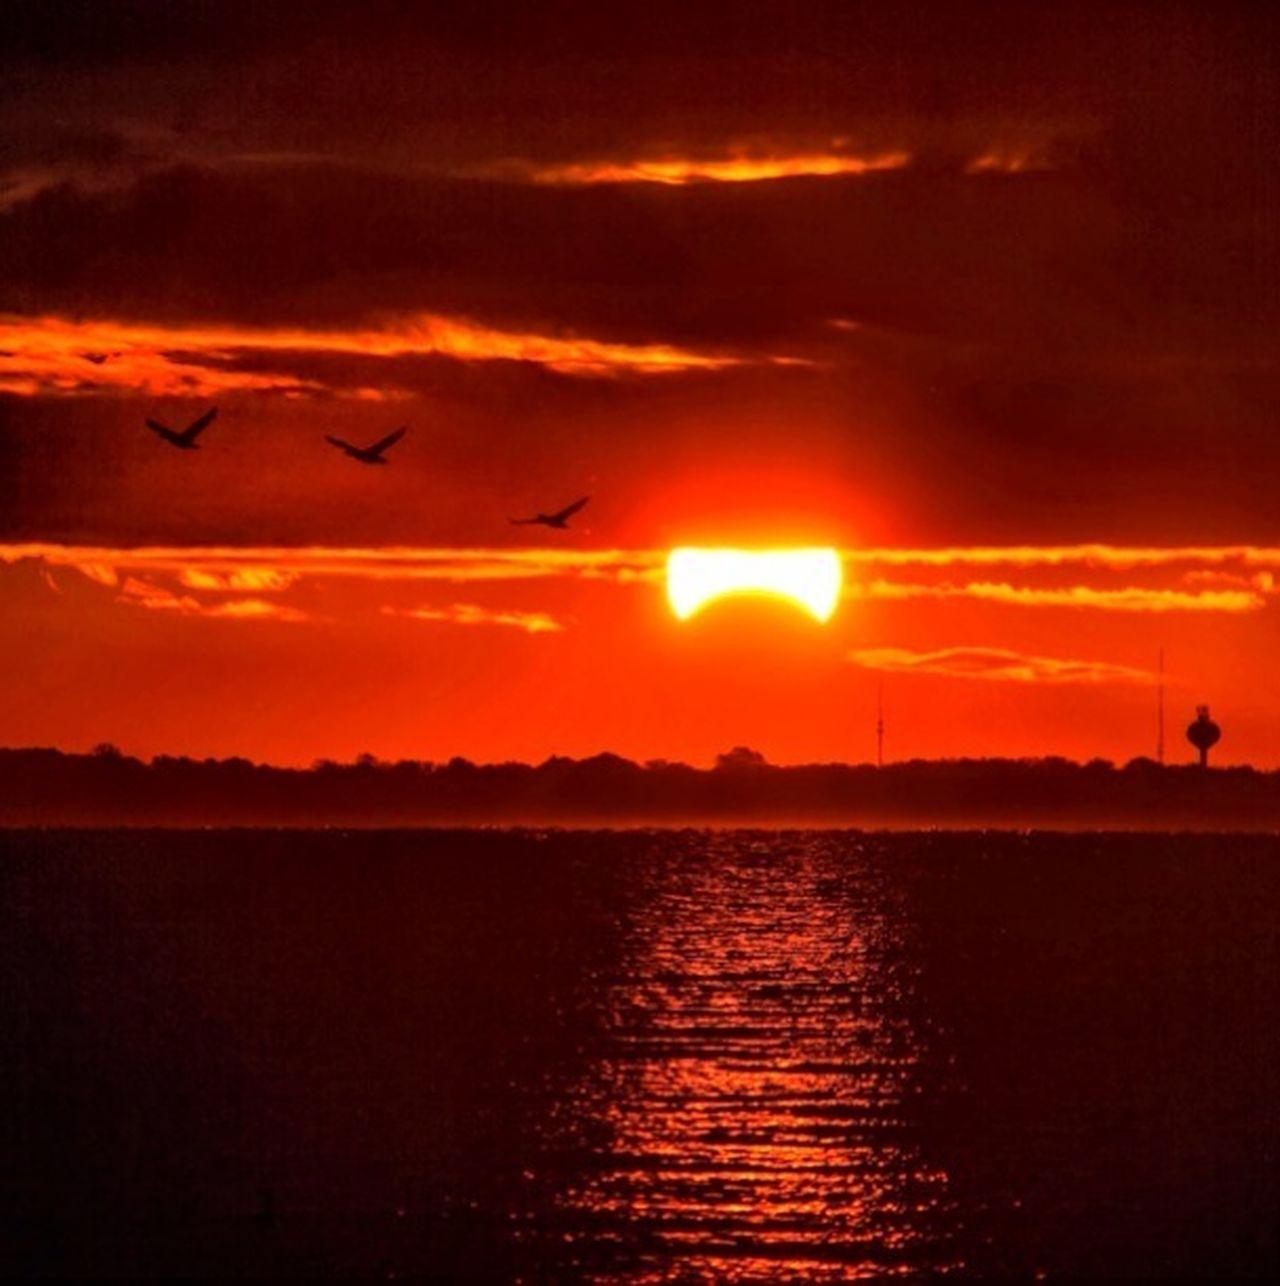 Eclipse 3. Eye4photography Eyemnaturelover Water_collection Sunset #skyporn #cloudporn # Bestskyever #gorgeous # Beautiful #stunning